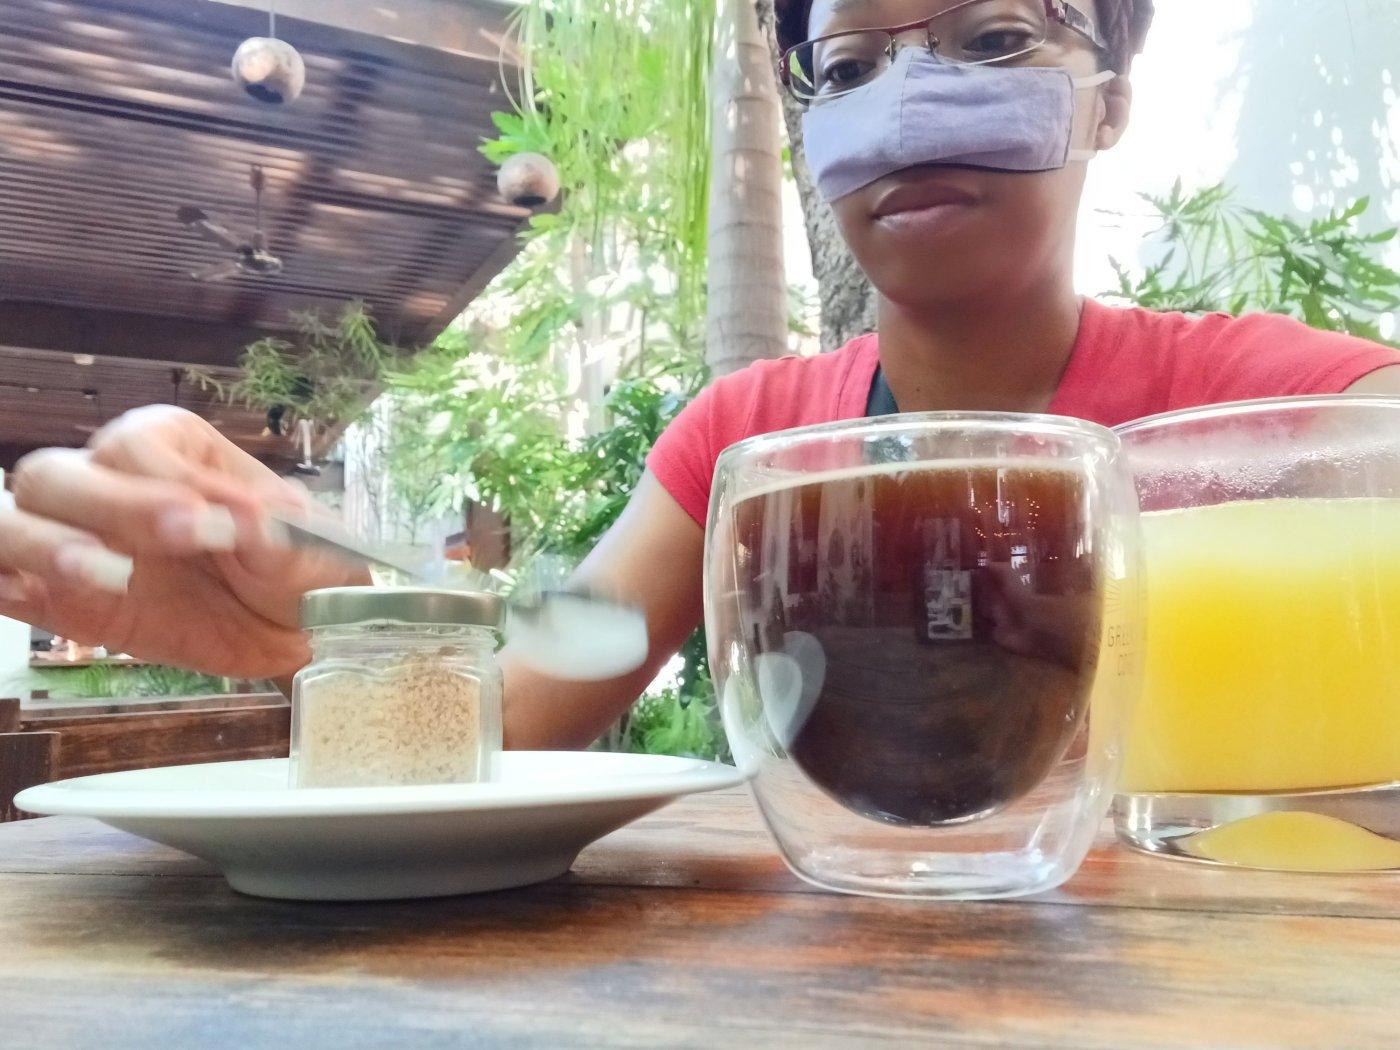 First morning in Merida, Mexico breakfast.